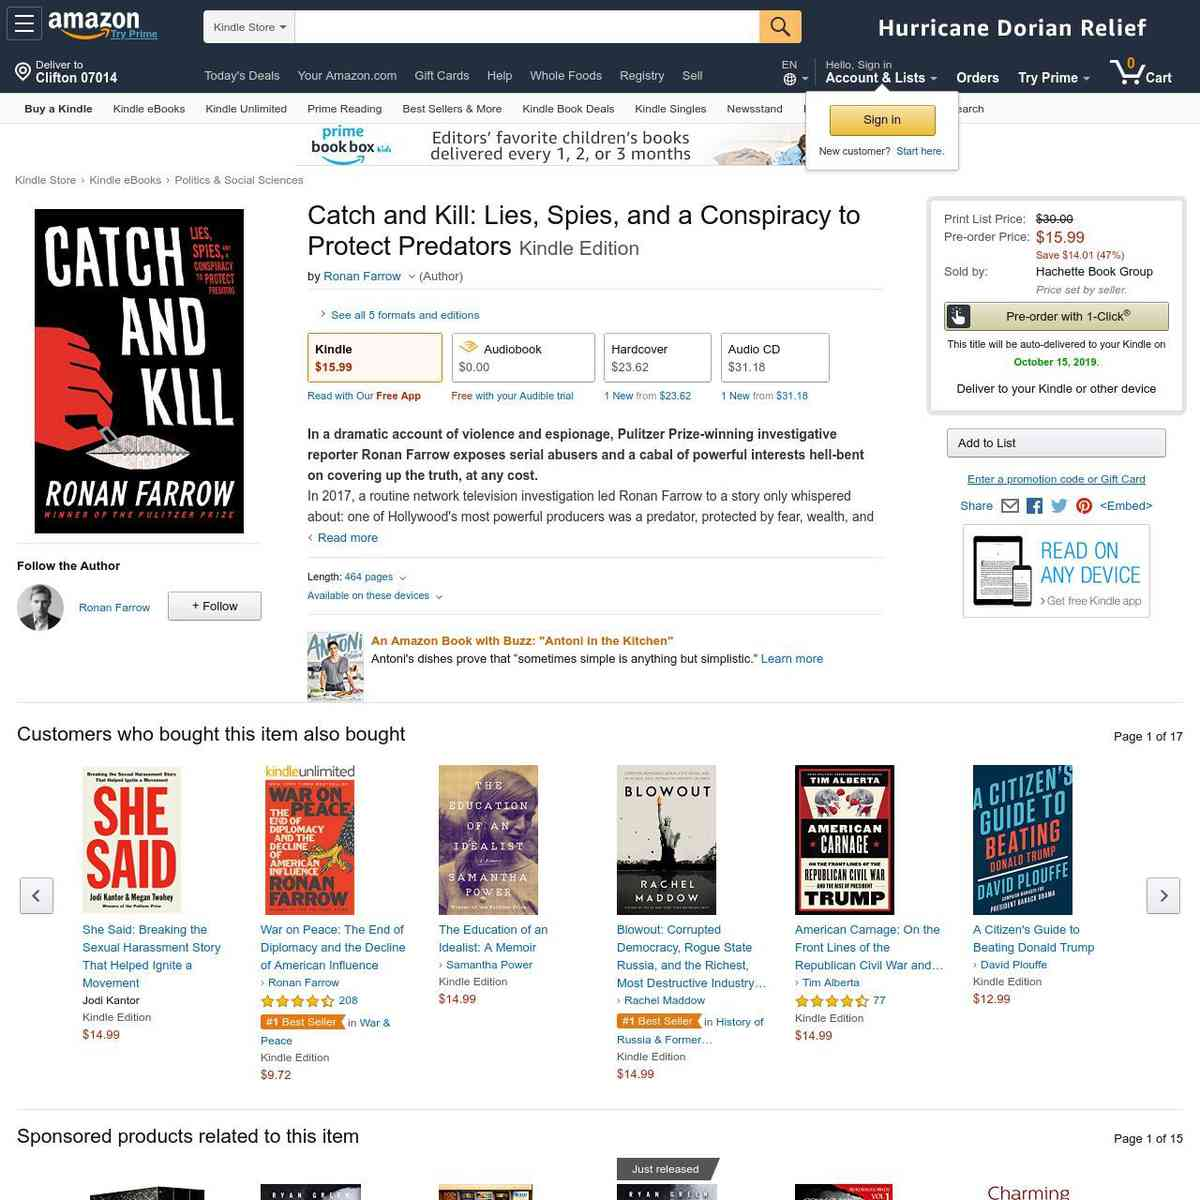 amazon.com/Catch-Kill-Conspiracy-Protect-Predators-ebook/dp/B07TD413RV